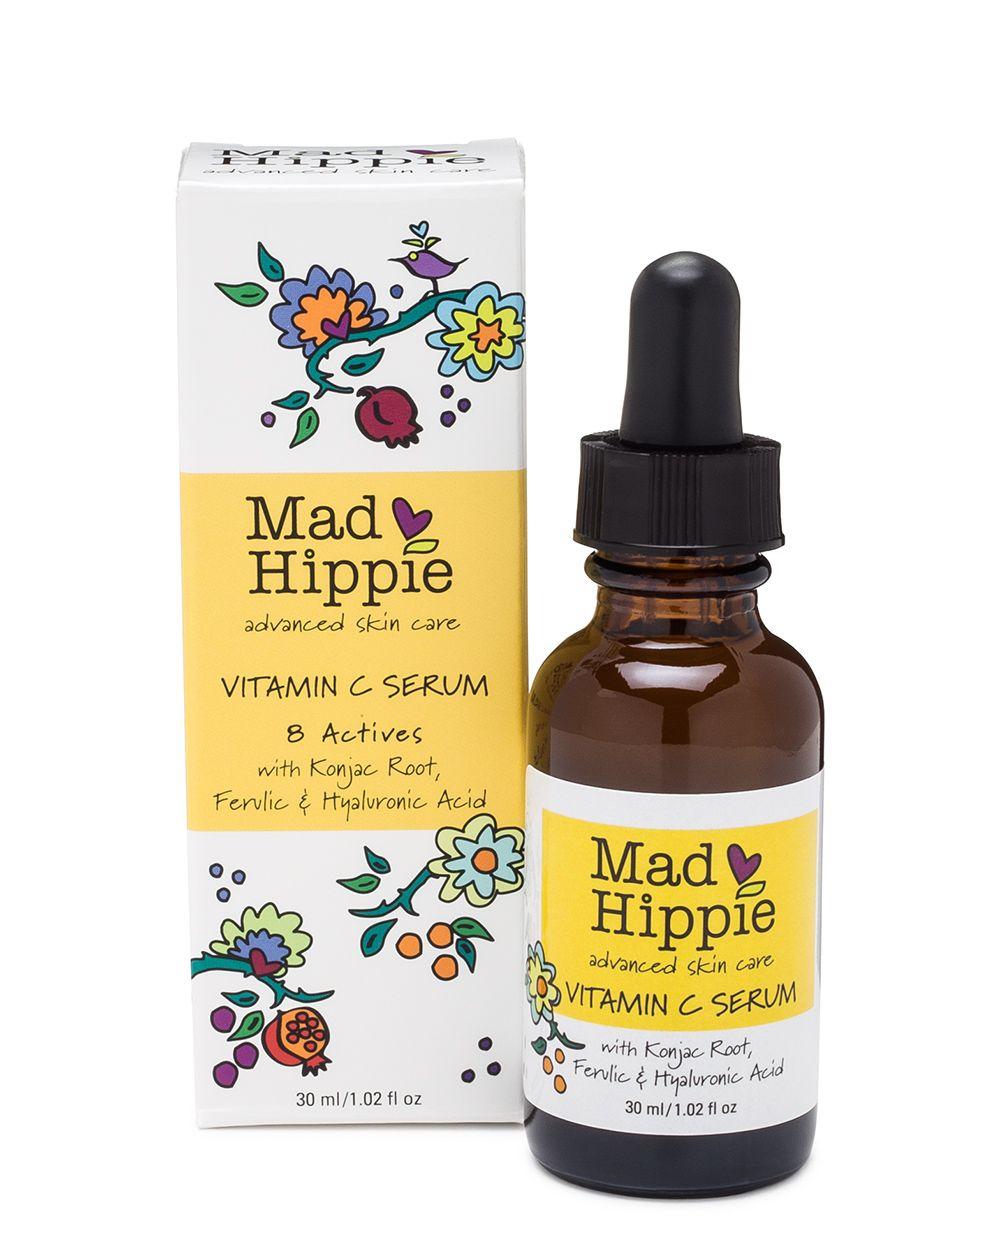 Vitamin C Serum In 2020 Mad Hippie Skin Care Natural Vitamin C Mad Hippie